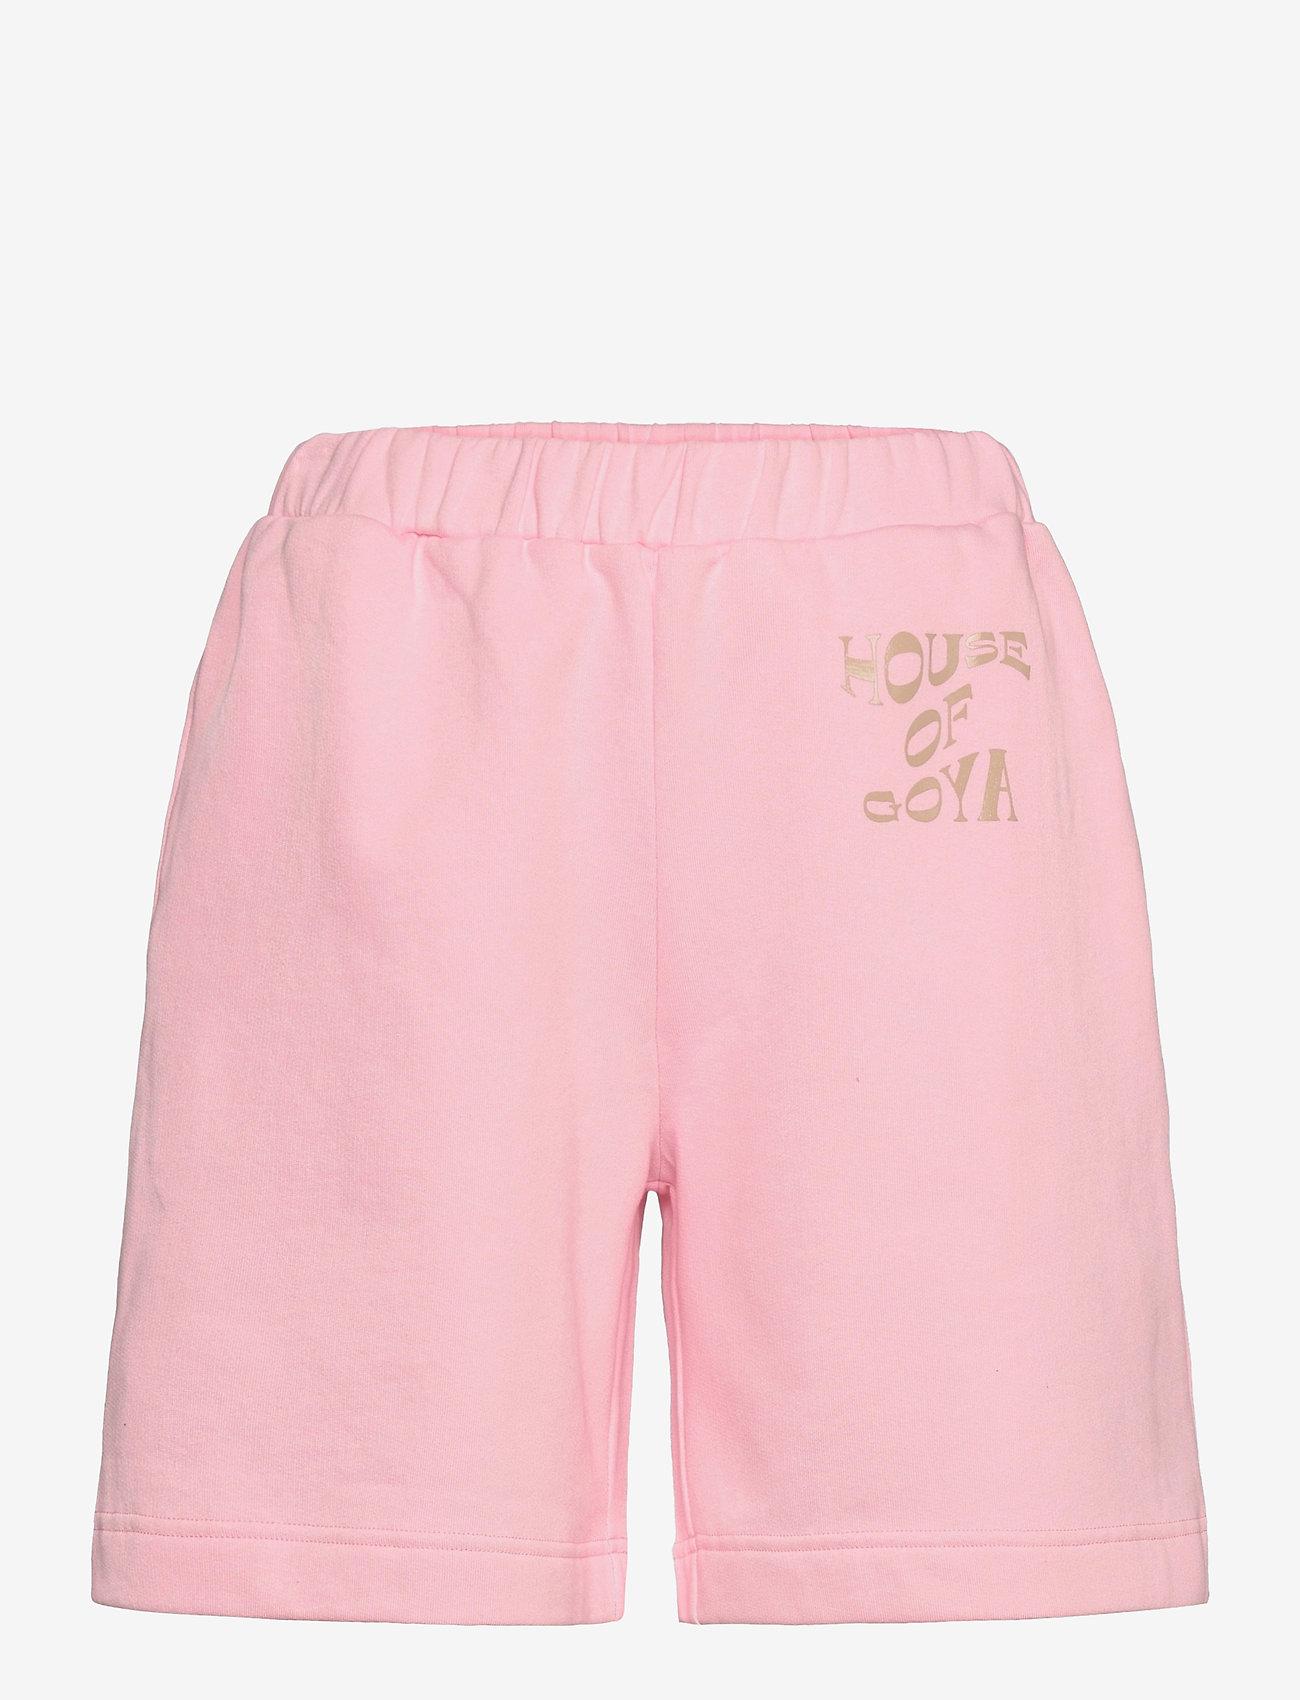 STINE GOYA - Signe, 1209 Tracksuit Goya - shorts casual - pink - 0